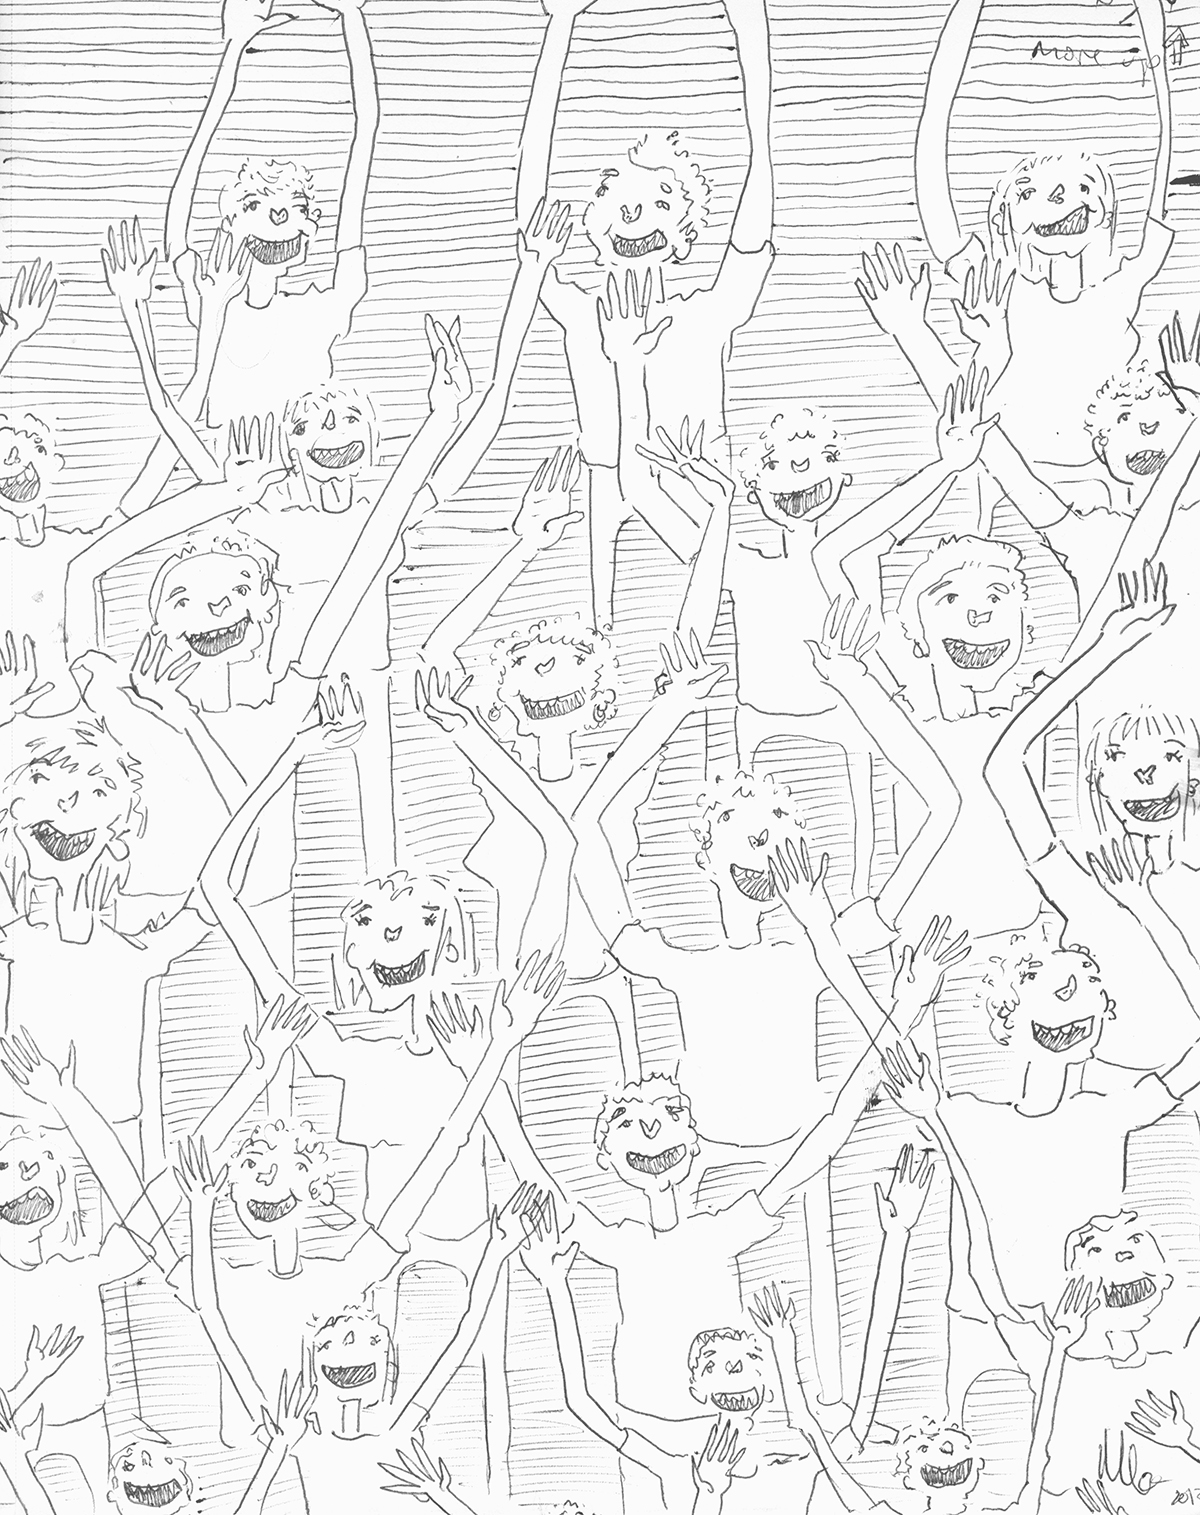 1200x1515 M.m.gaman Sketchbook 798 Crowd Study